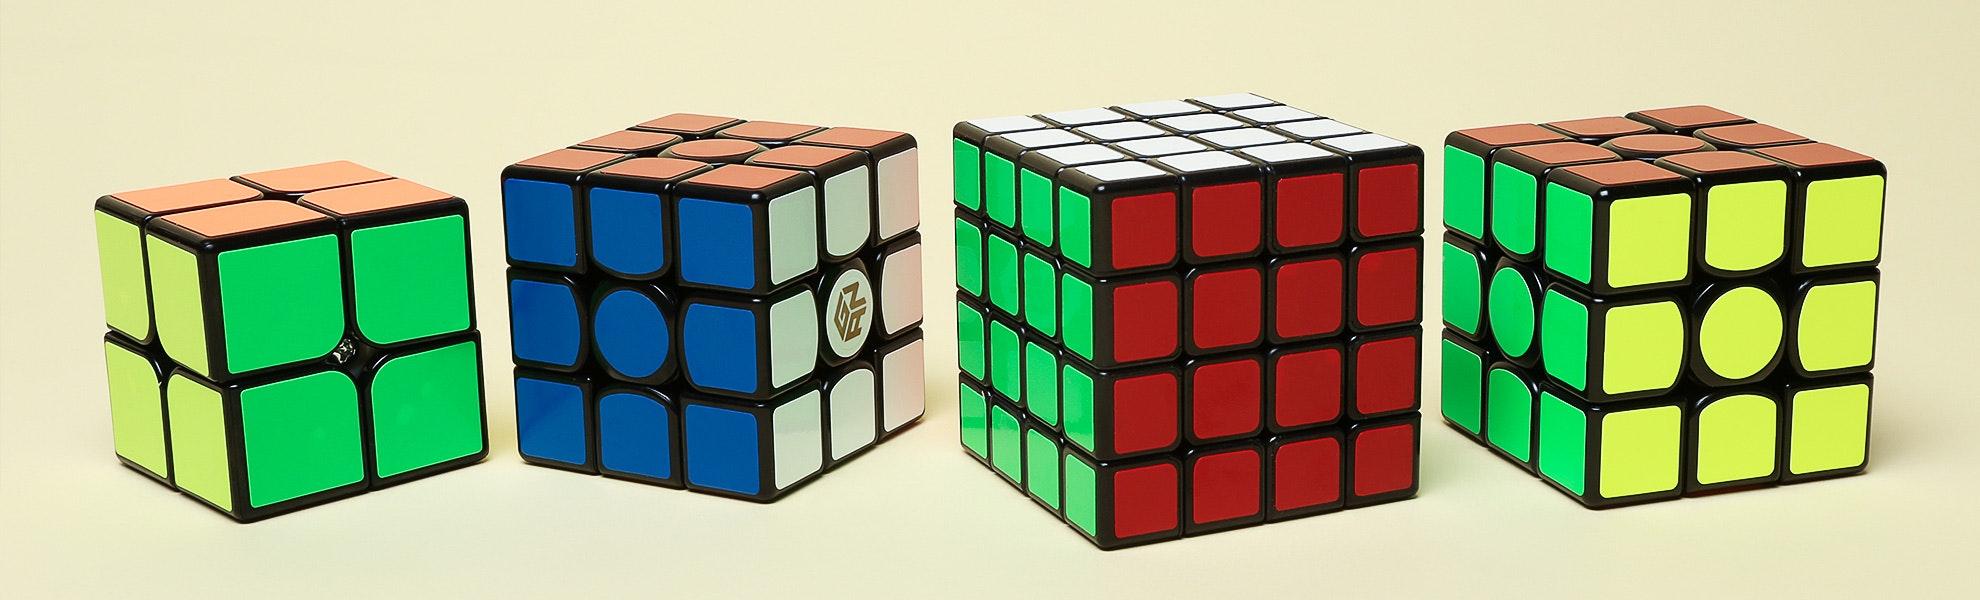 Speed Cube Bundle: 2x2, 3x3 & 4x4